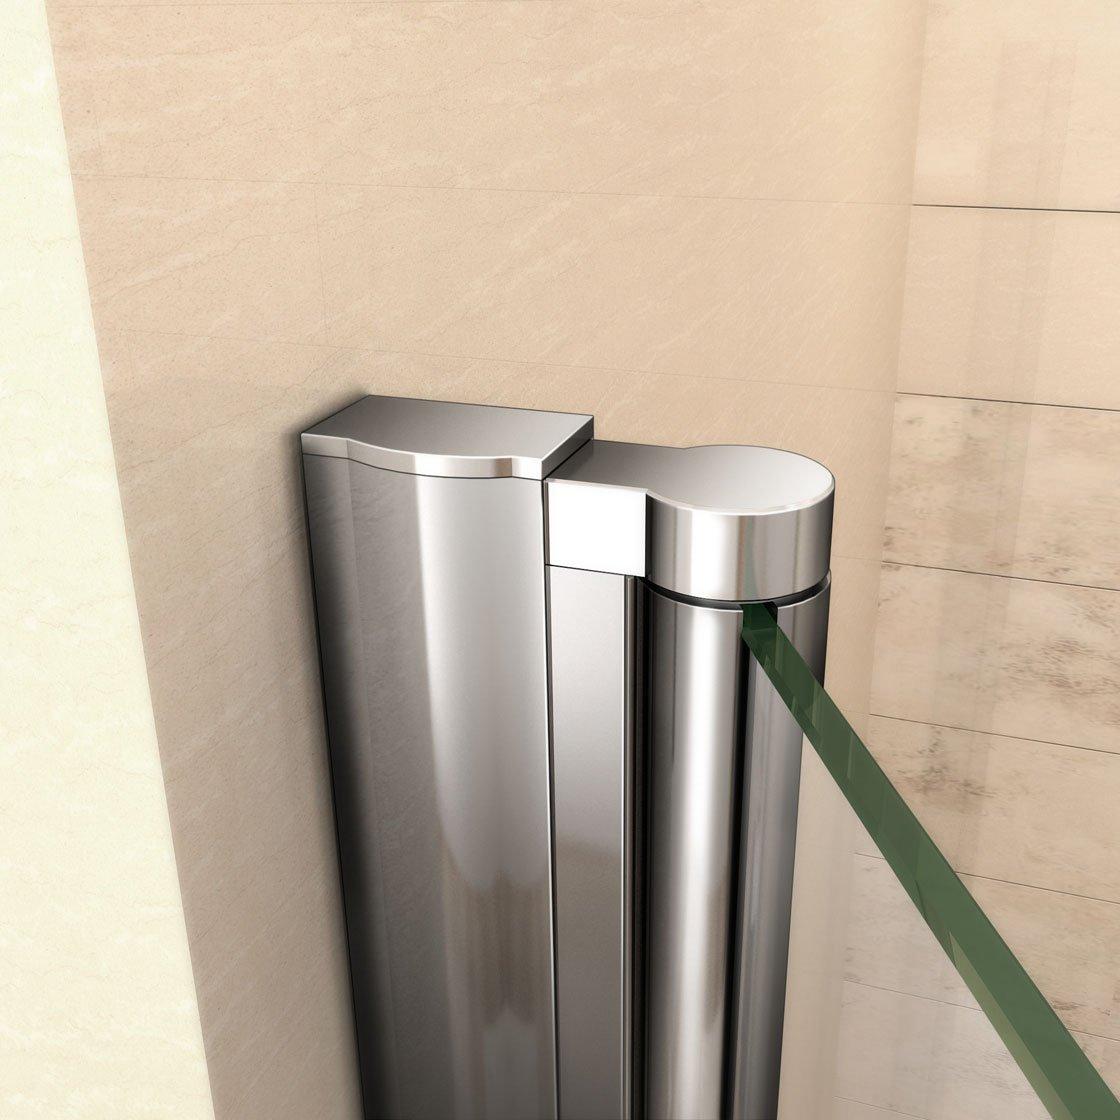 Mamparas de ducha pantalla ba/ño 6mm Easyclean vidrio 90x195cm